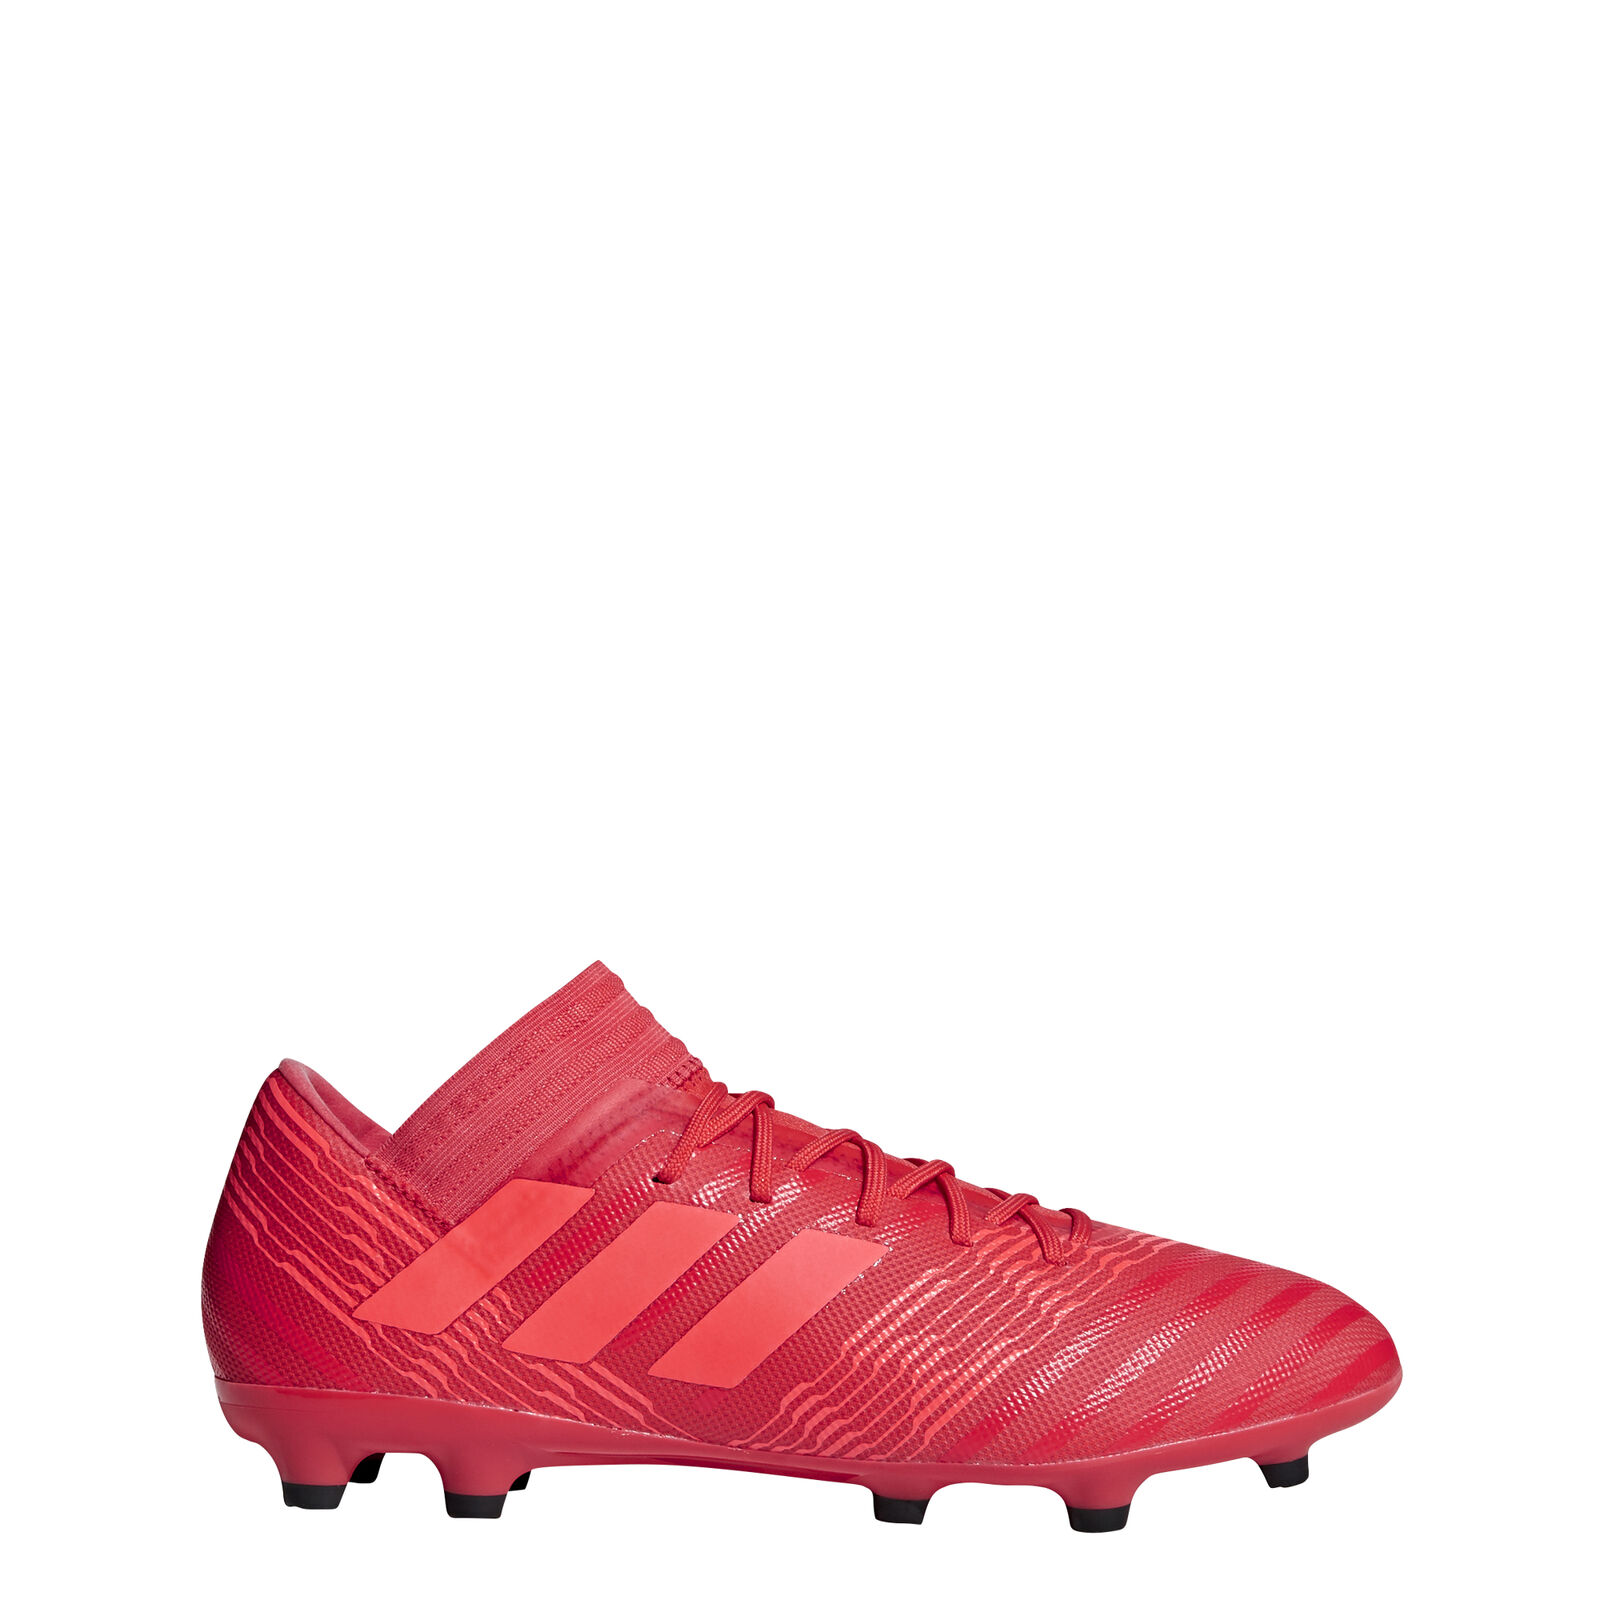 Adidas Football Boots Nemeziz 17.3 Fg Cam shoes Football Outdoor